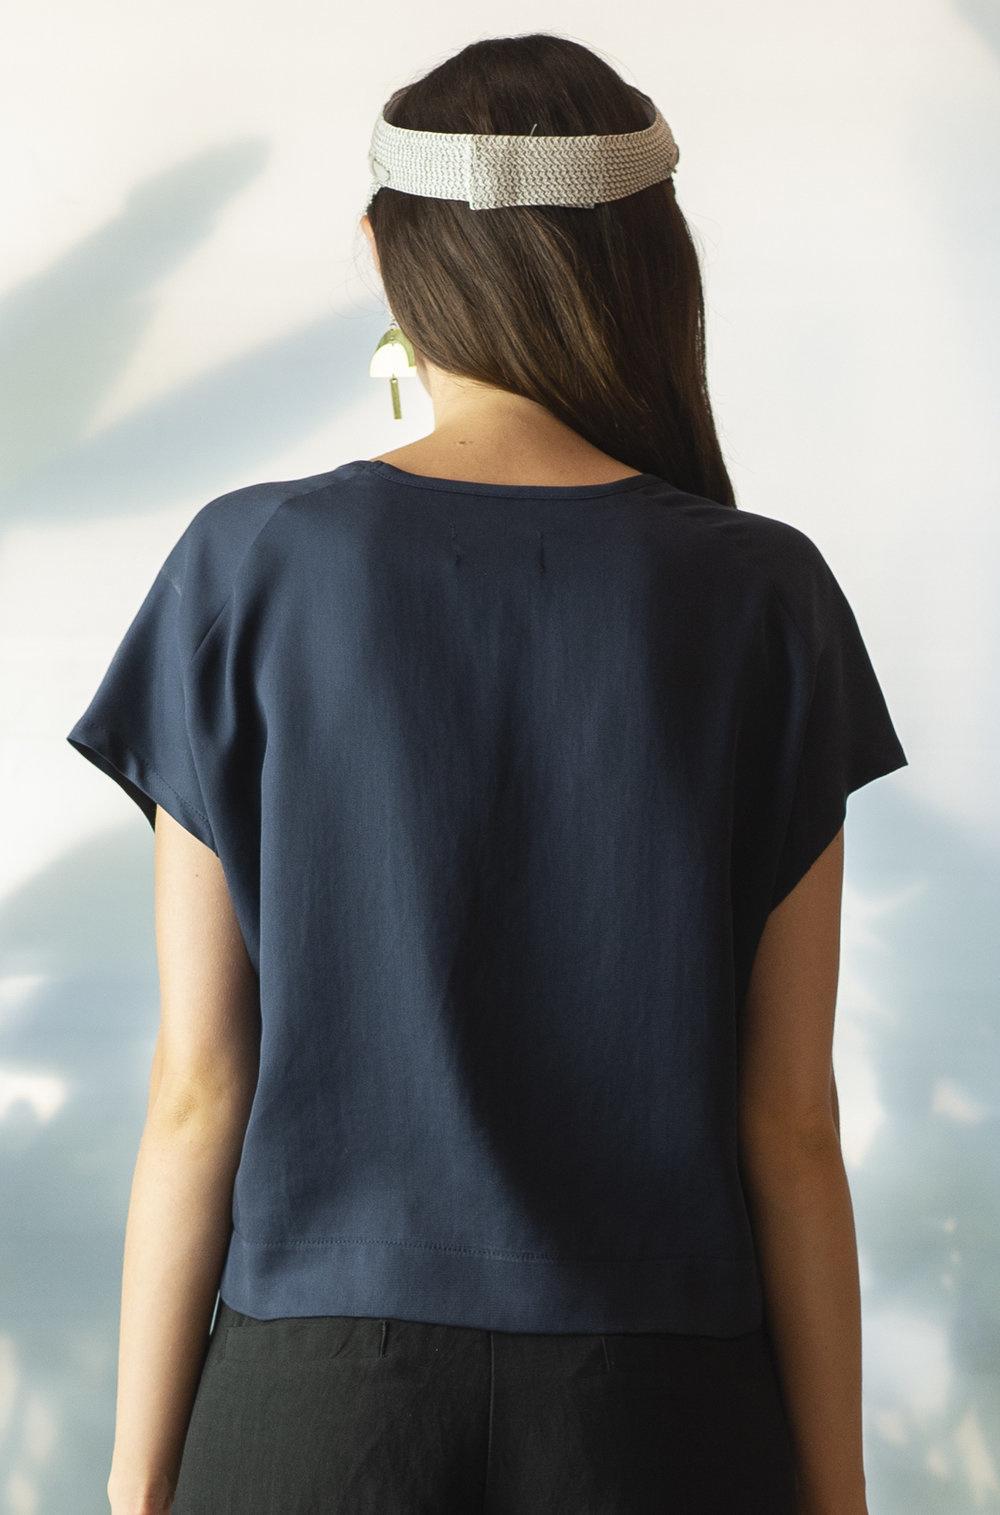 Bodybag Tofino Tencel Top - 5 couleurs